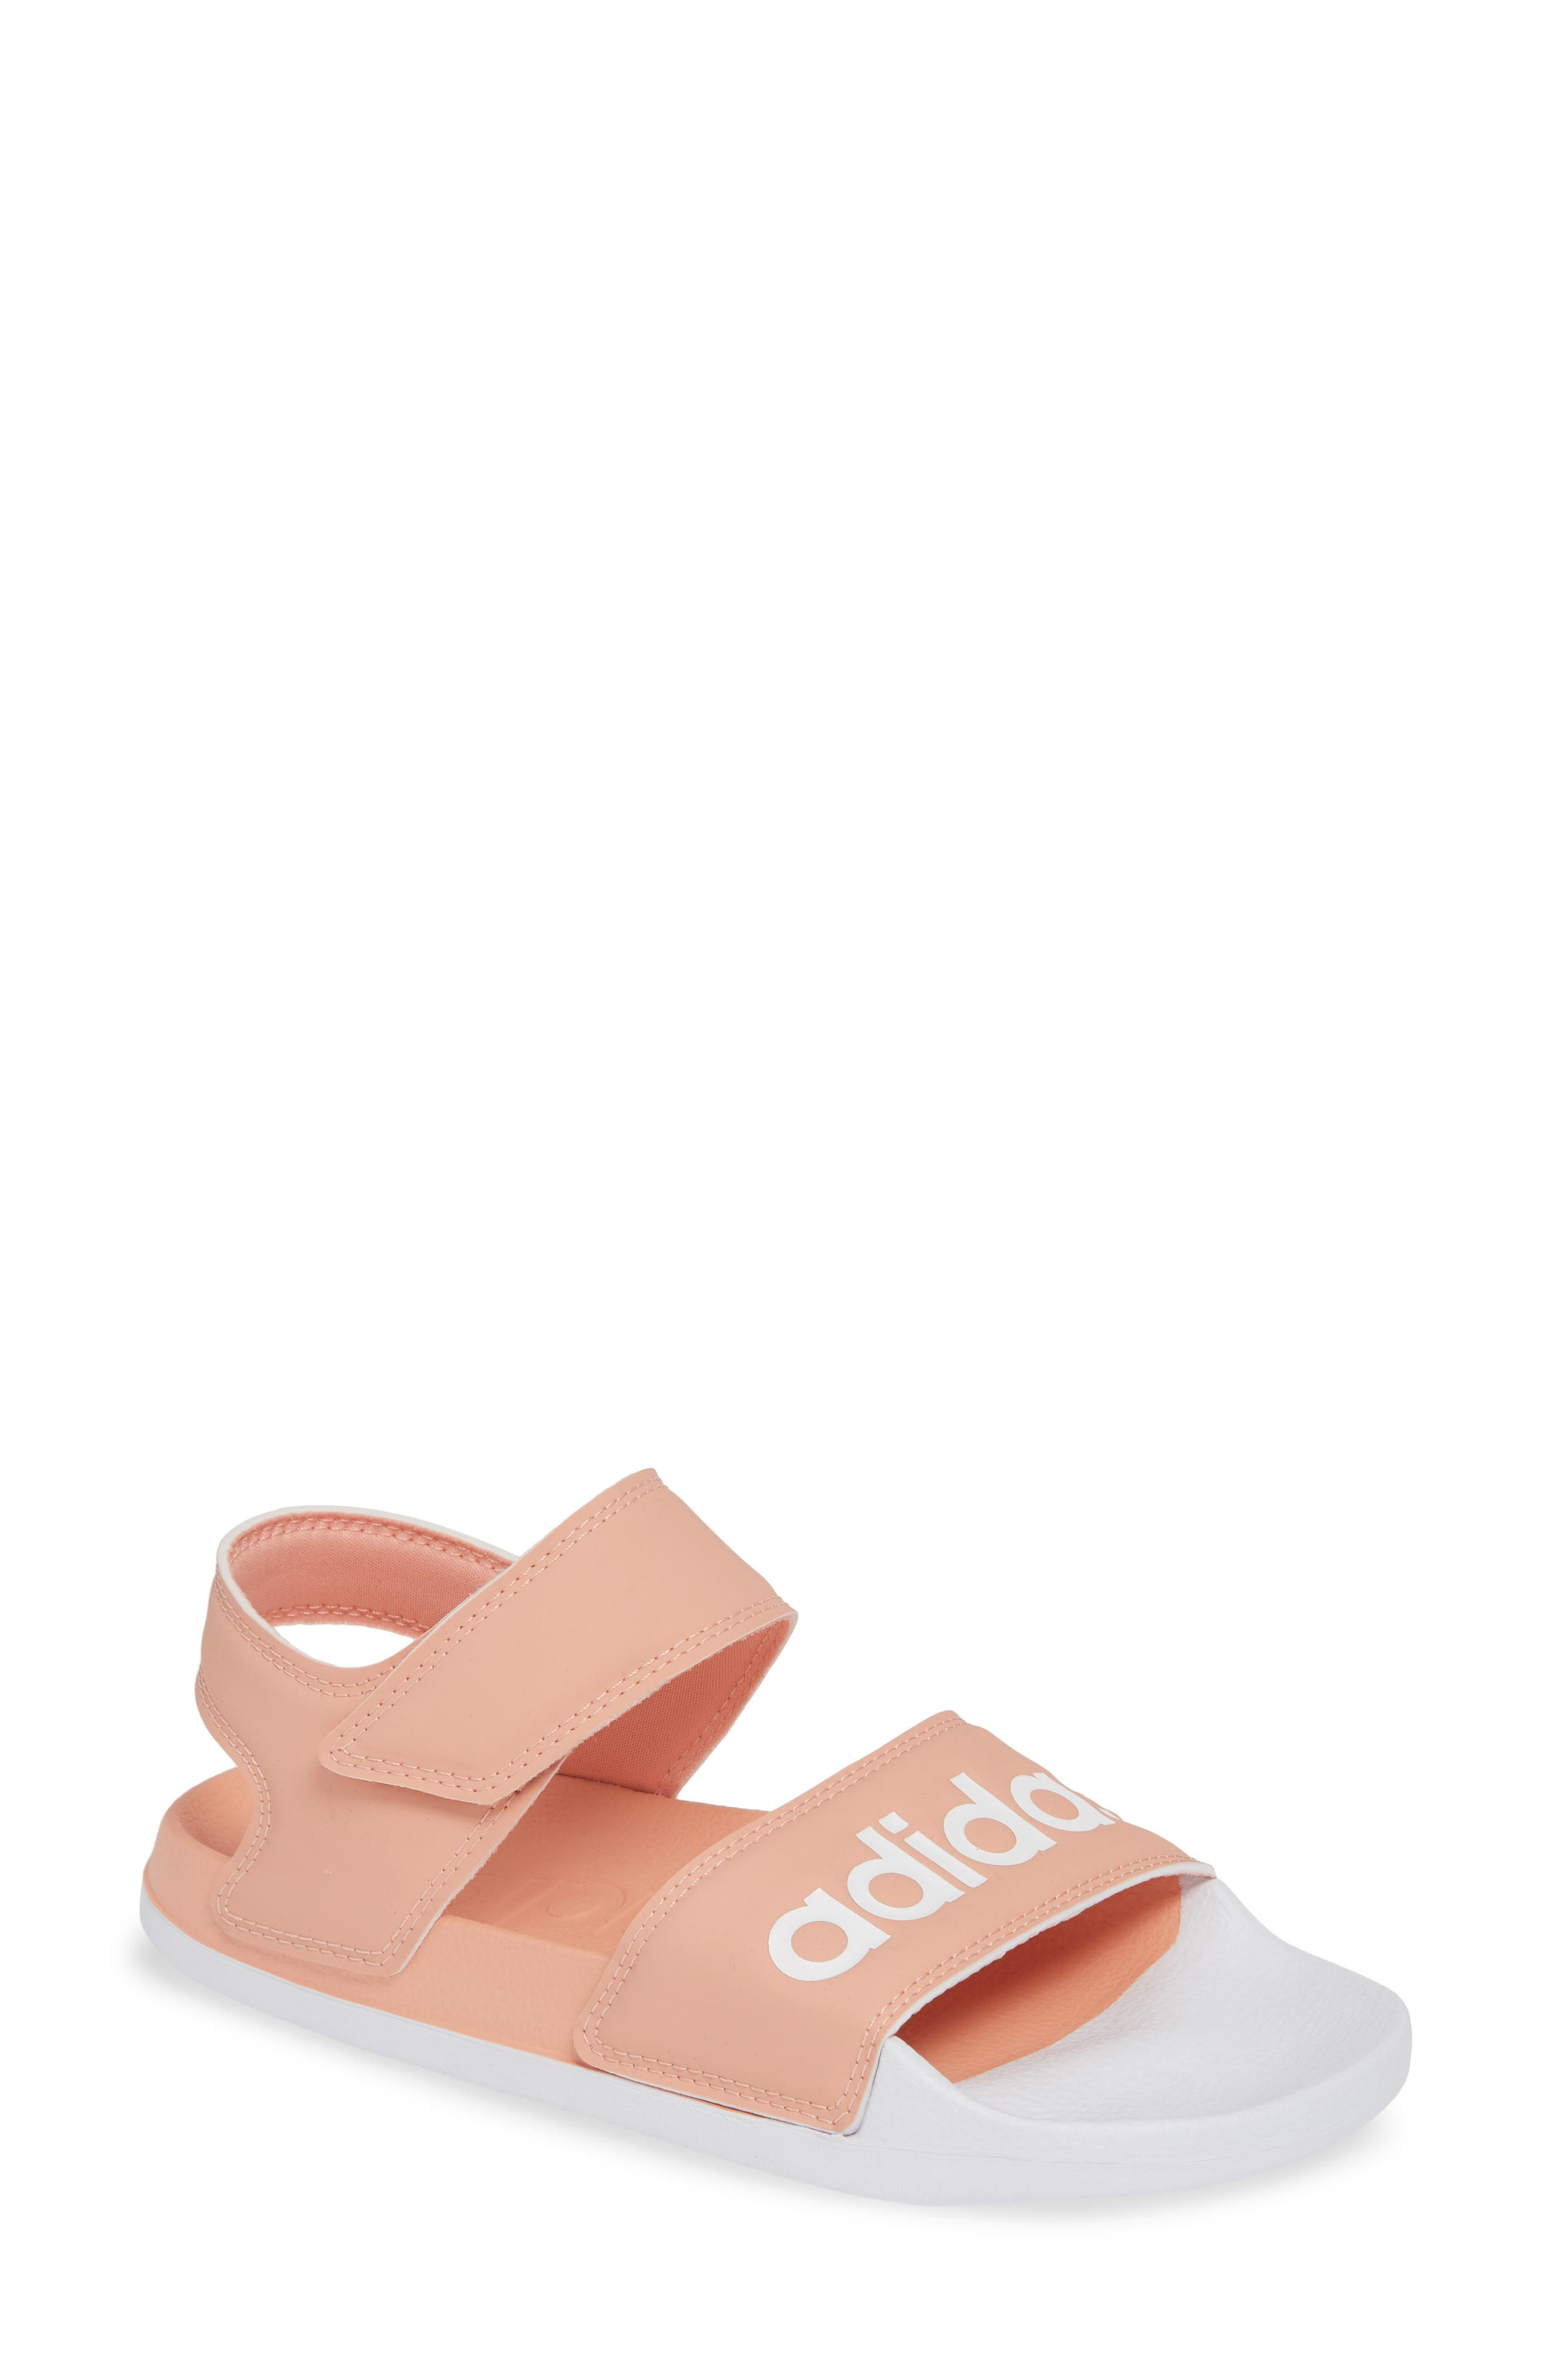 7e679189c675 adidas sandals